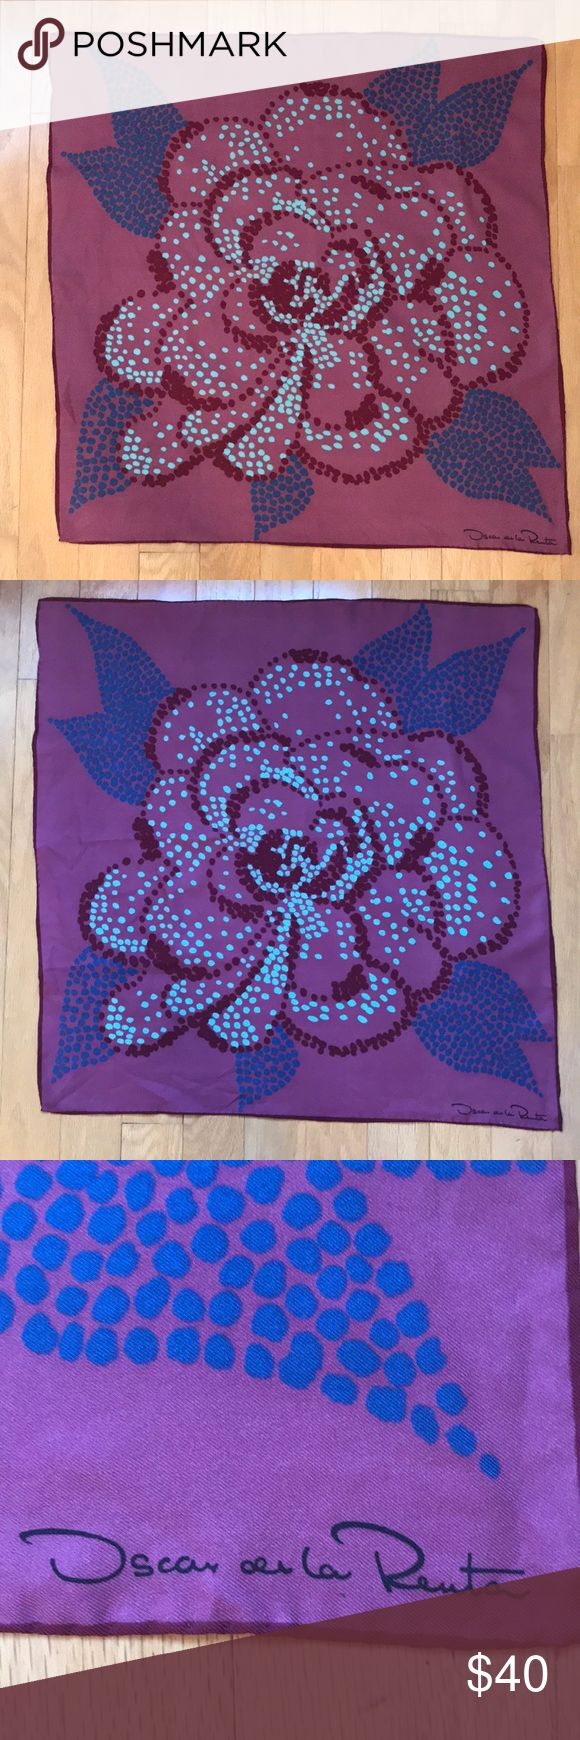 Oscar de la Renta Scarf Purple background with polka dotted flower in wine burgundy and ligh gray blue with royal blue leaves. Silk blend fabric. Hand rolled hem. Oscar de la Renta Accessories Scarves & Wraps